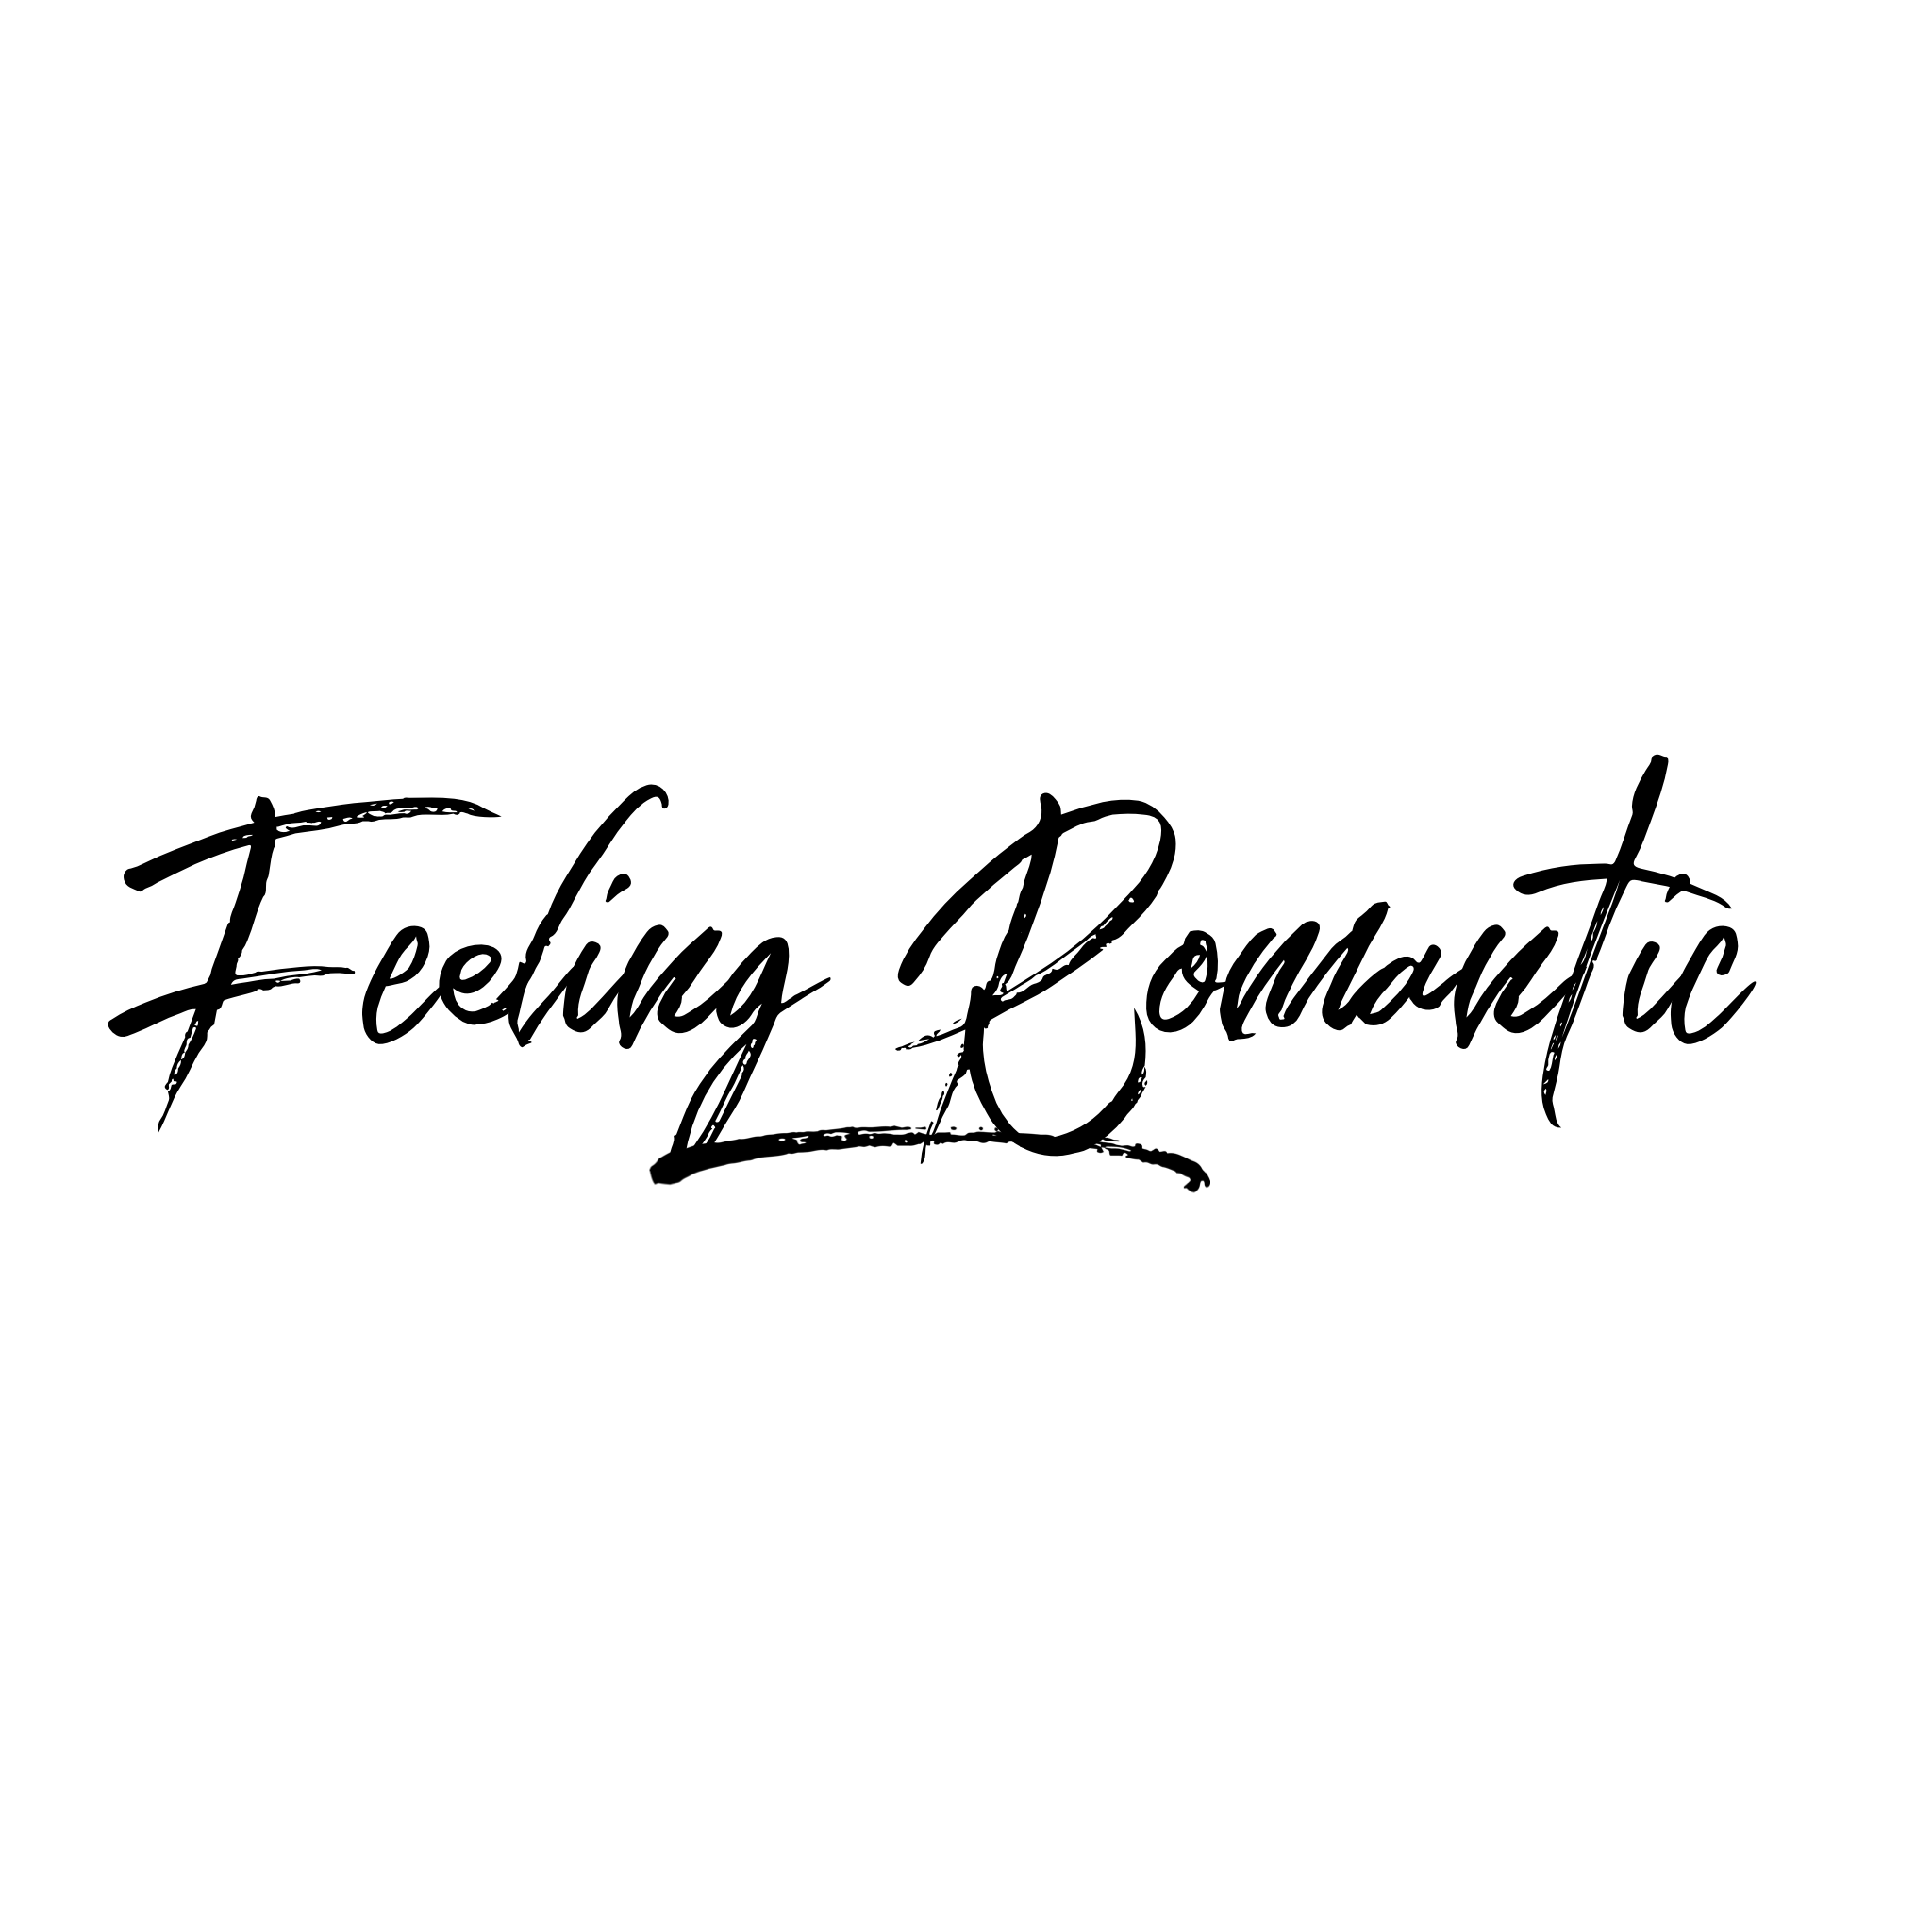 Feeling Romantic - urban rush